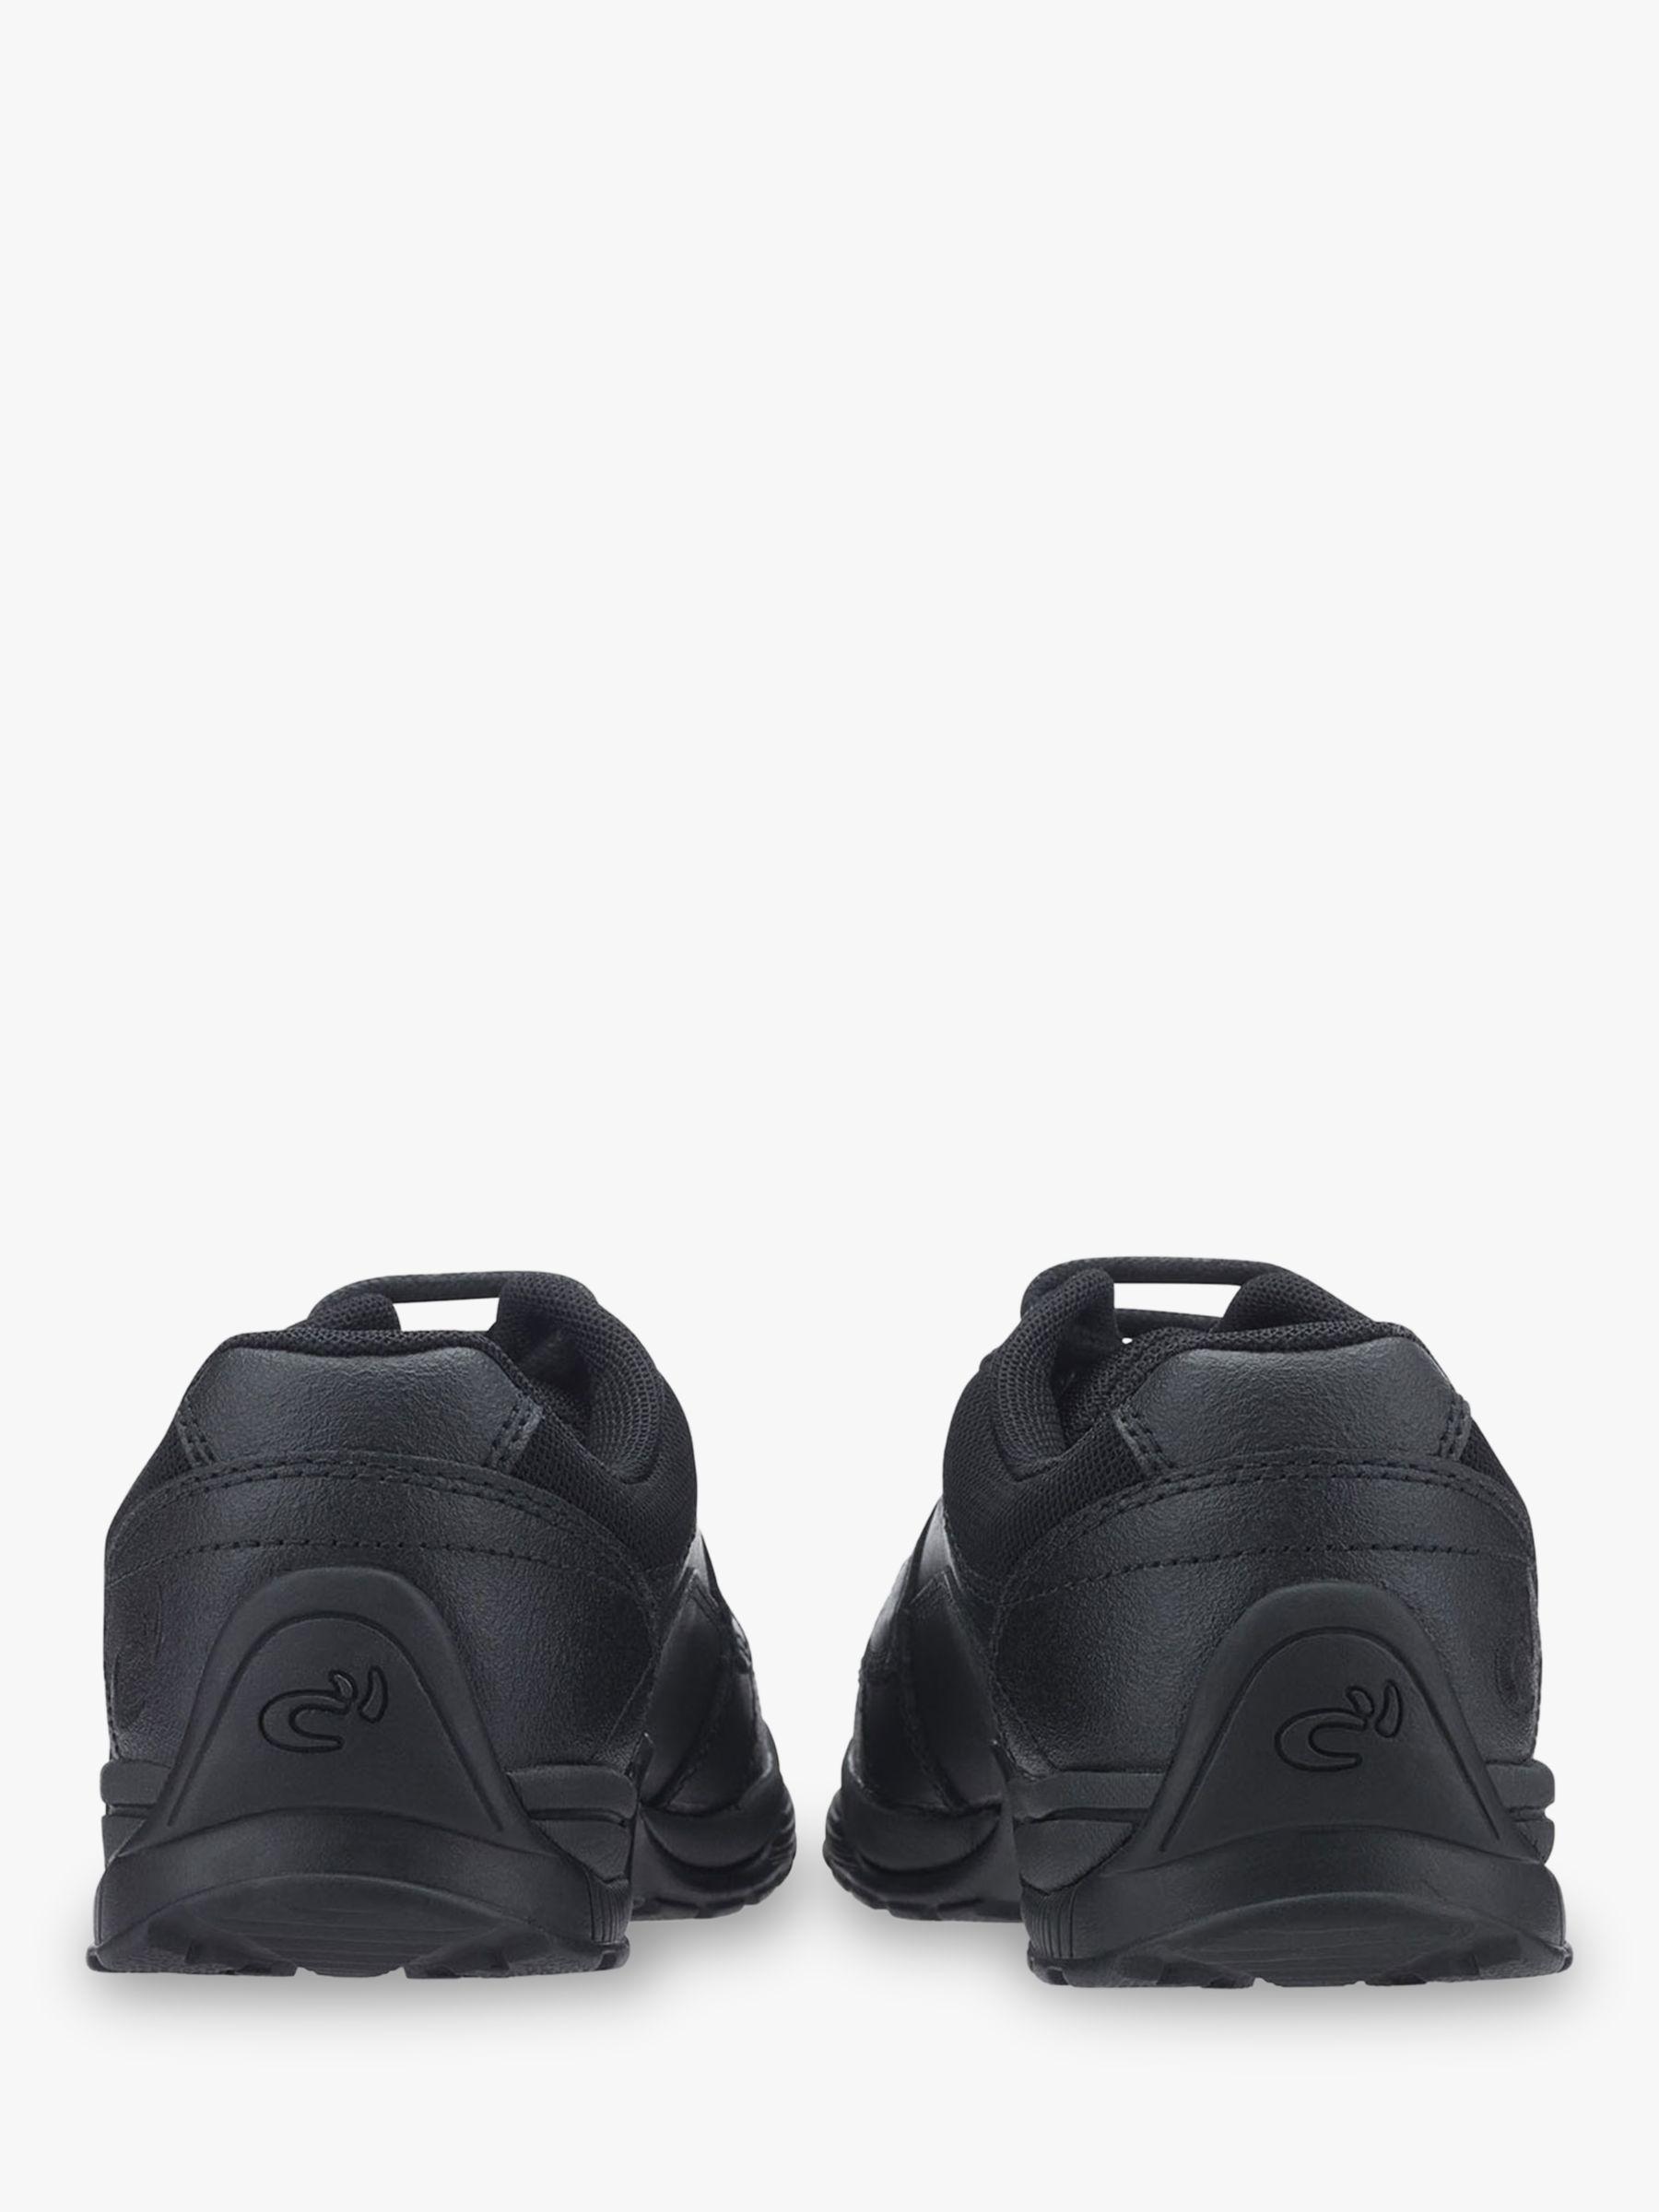 Start-Rite Start-rite Children's Rhino Dylan Shoes, Black